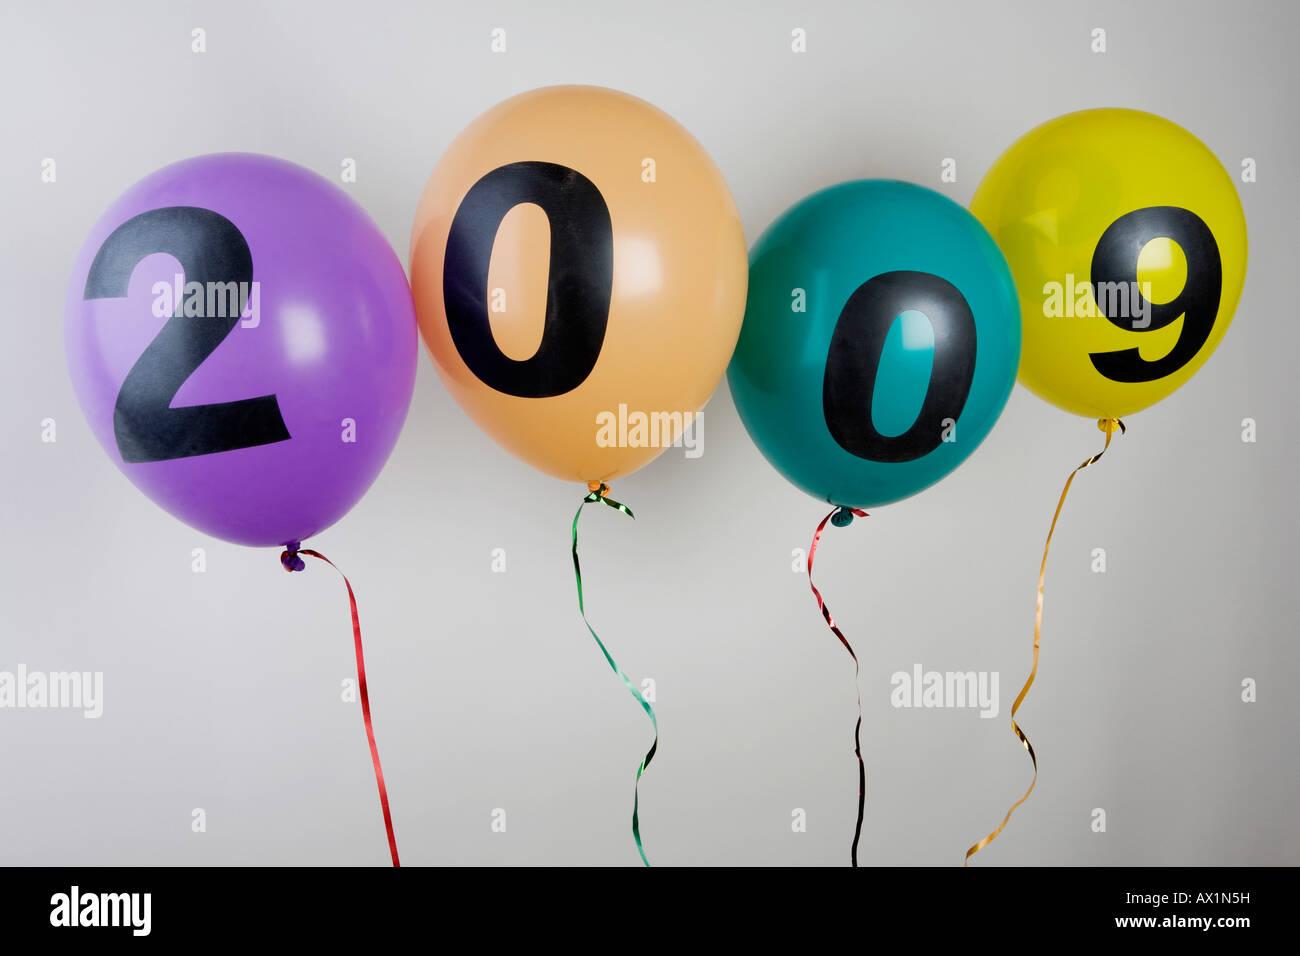 Balloons celebrating 2009 - Stock Image